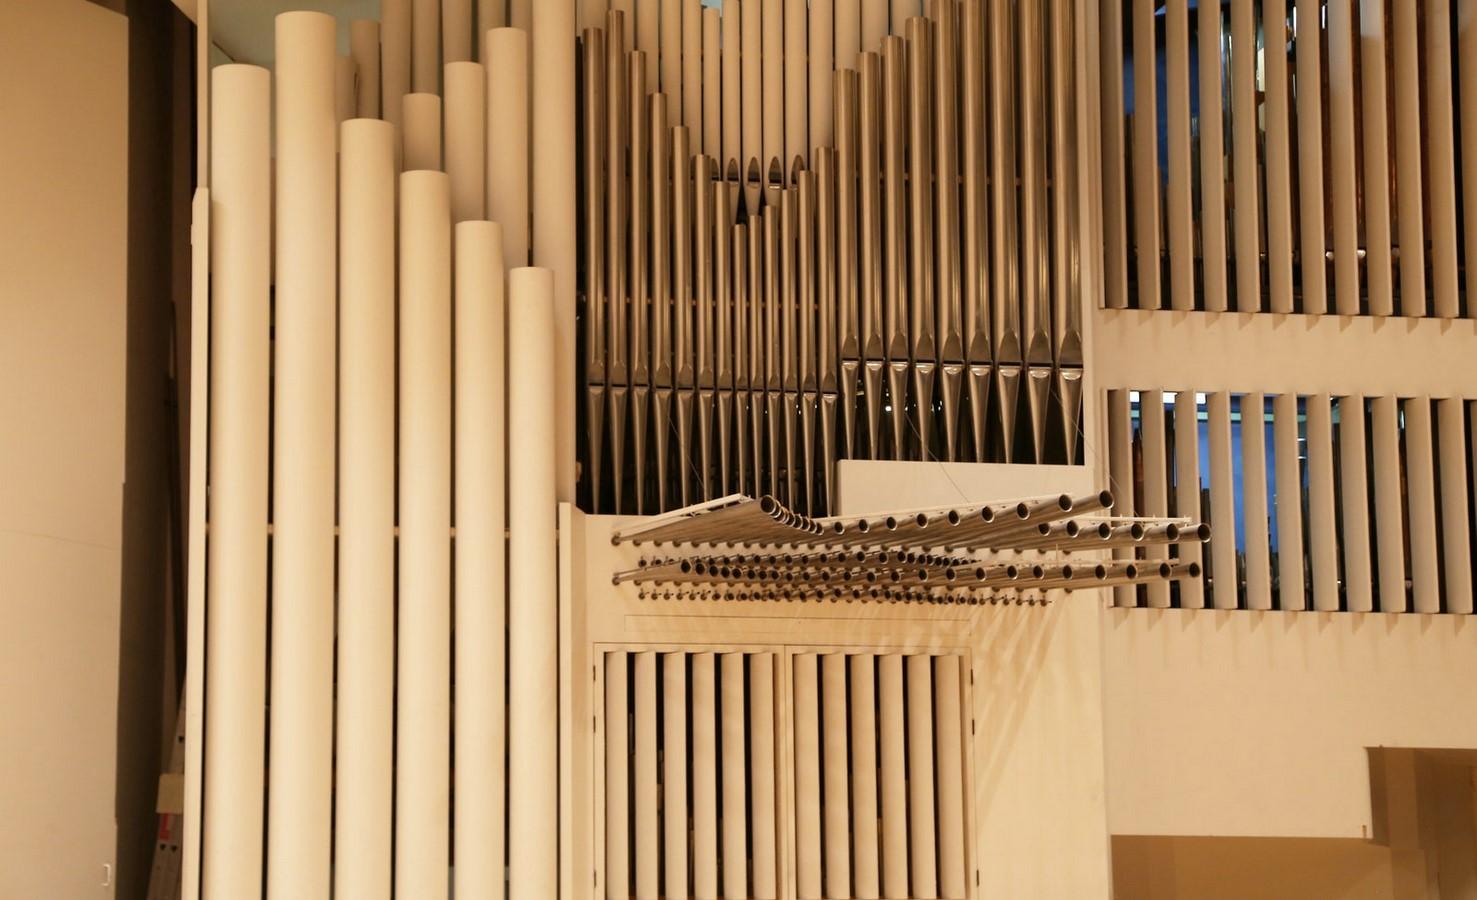 Finlandia Hall by Alvar Aalto: Celebrating Light and Nature - Sheet9